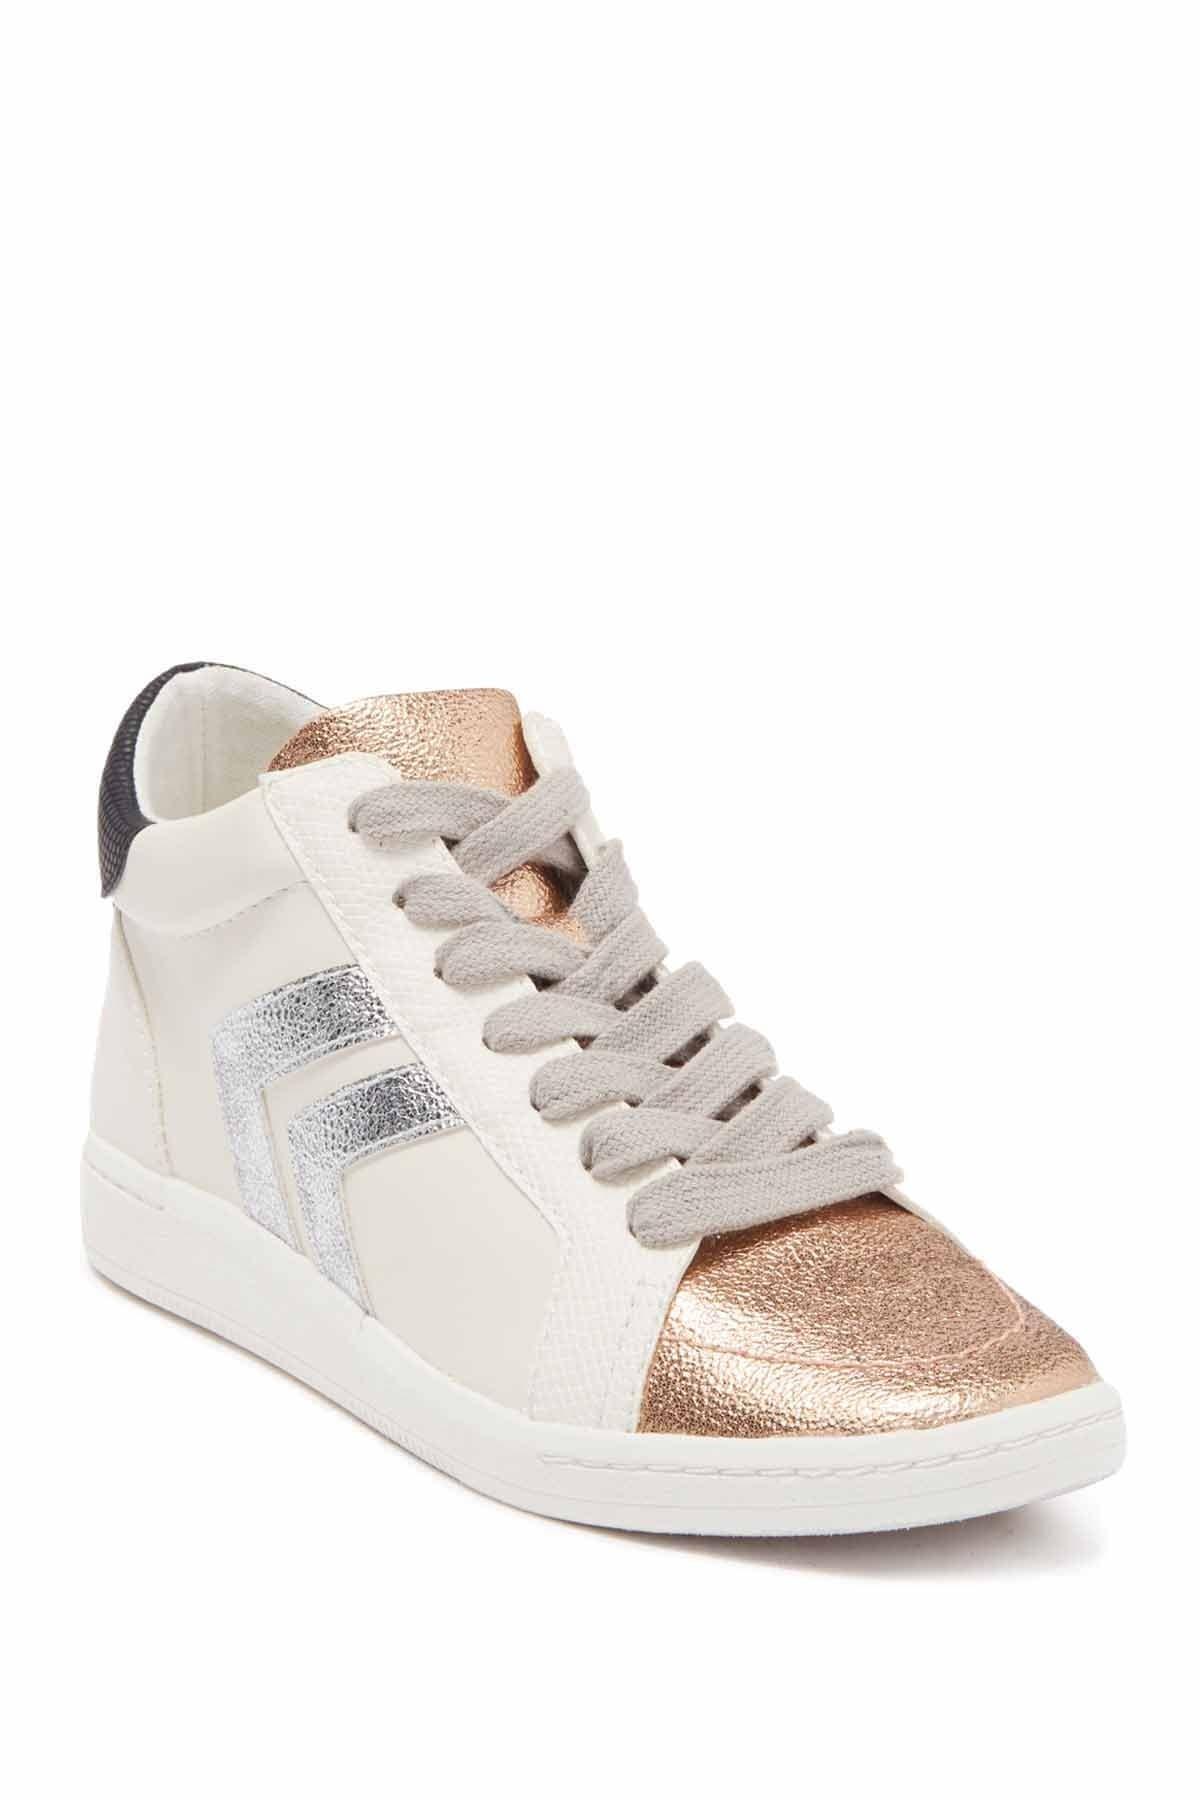 Image of Dolce Vita Nann Mid Top Sneaker